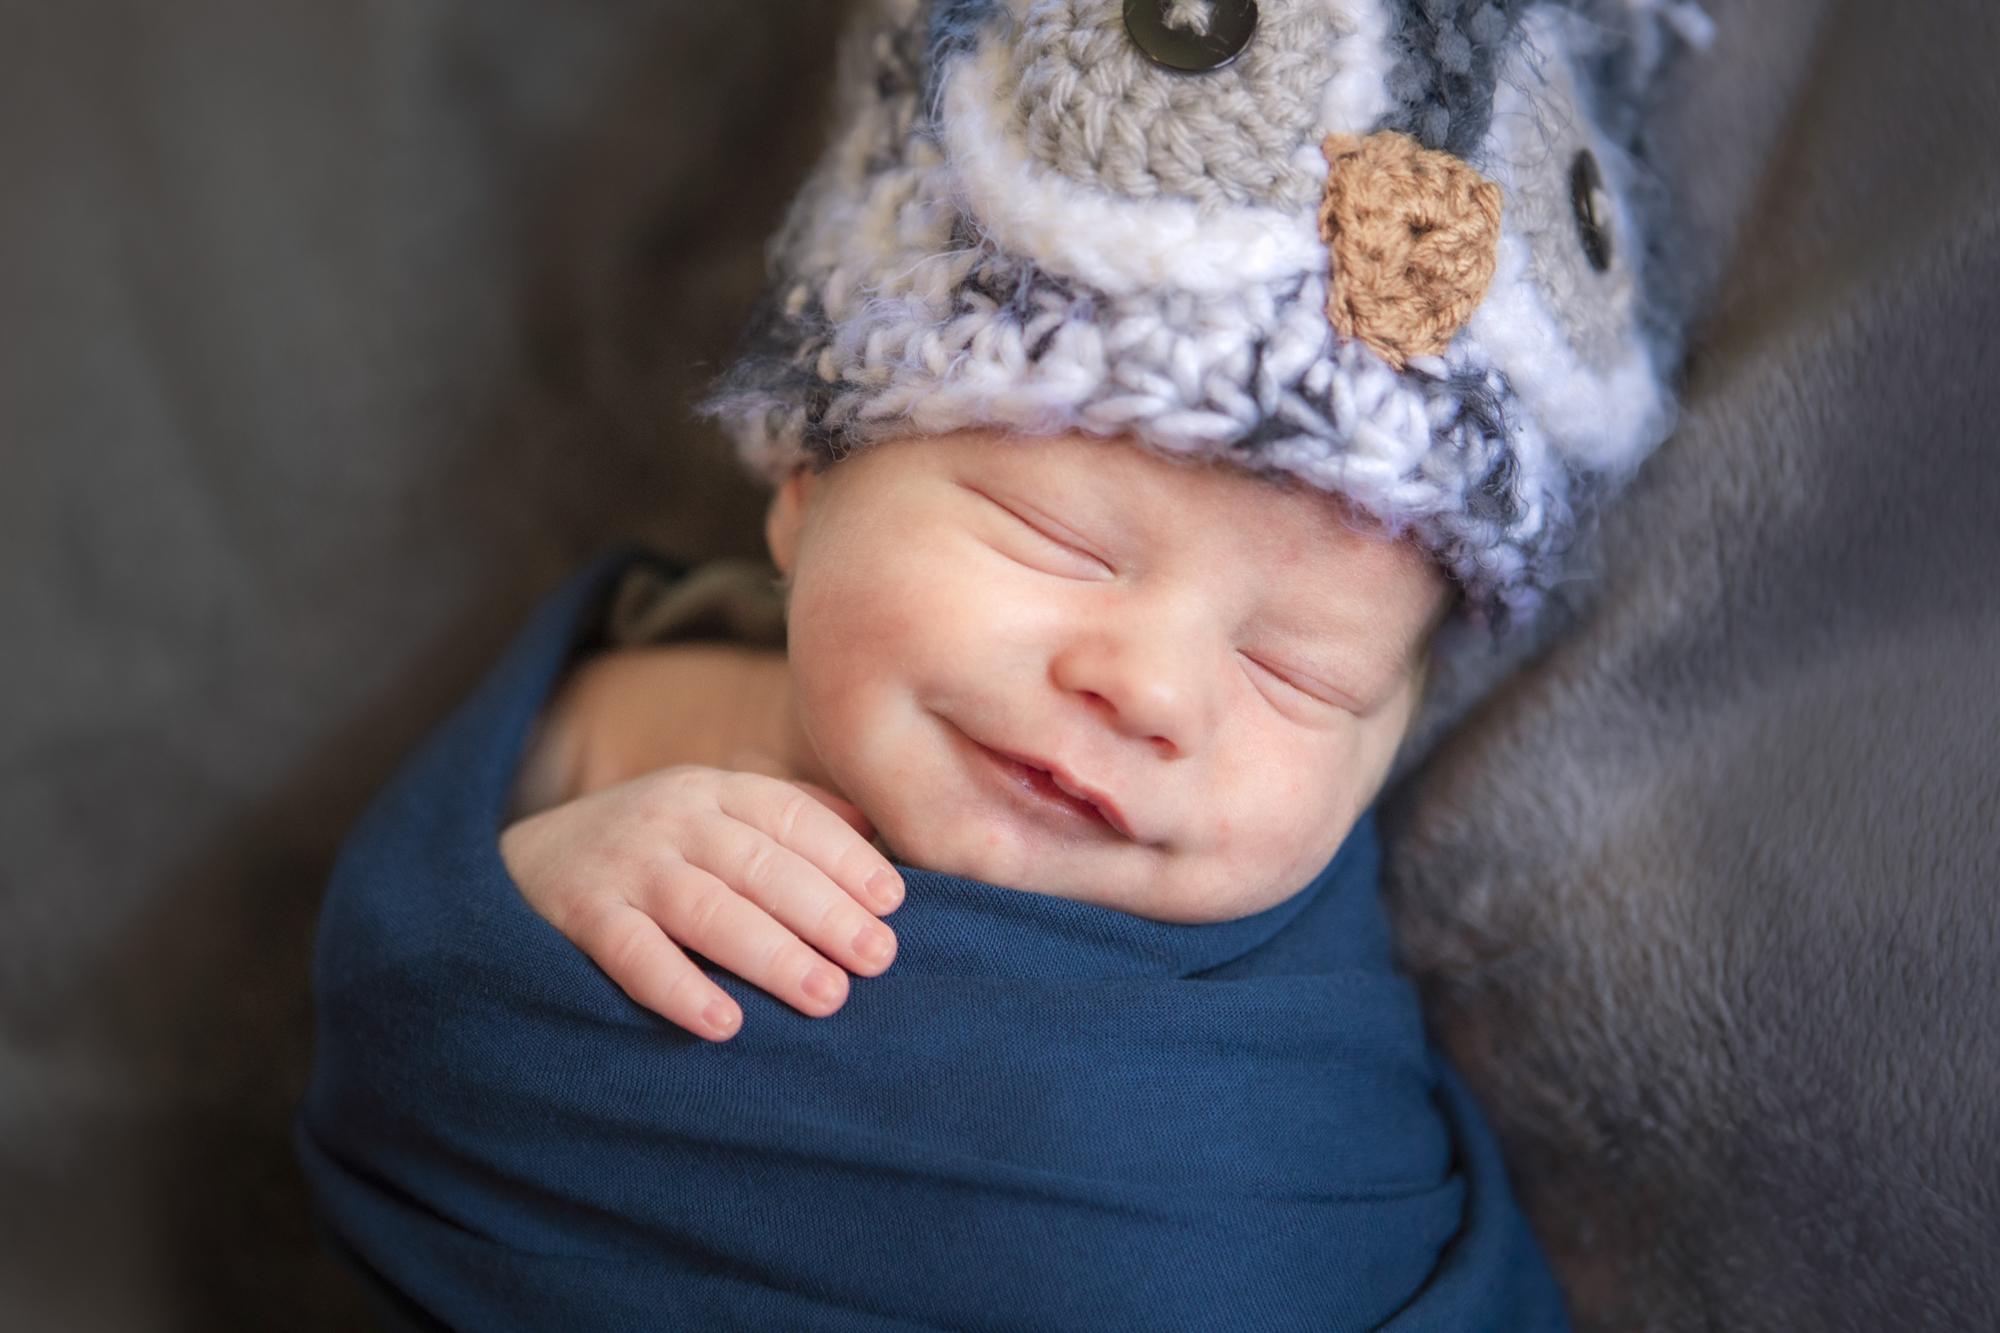 Baby Kyllian Newborn Portrait Session with Studio Misha Photogrpahy_BLOG-3.jpg